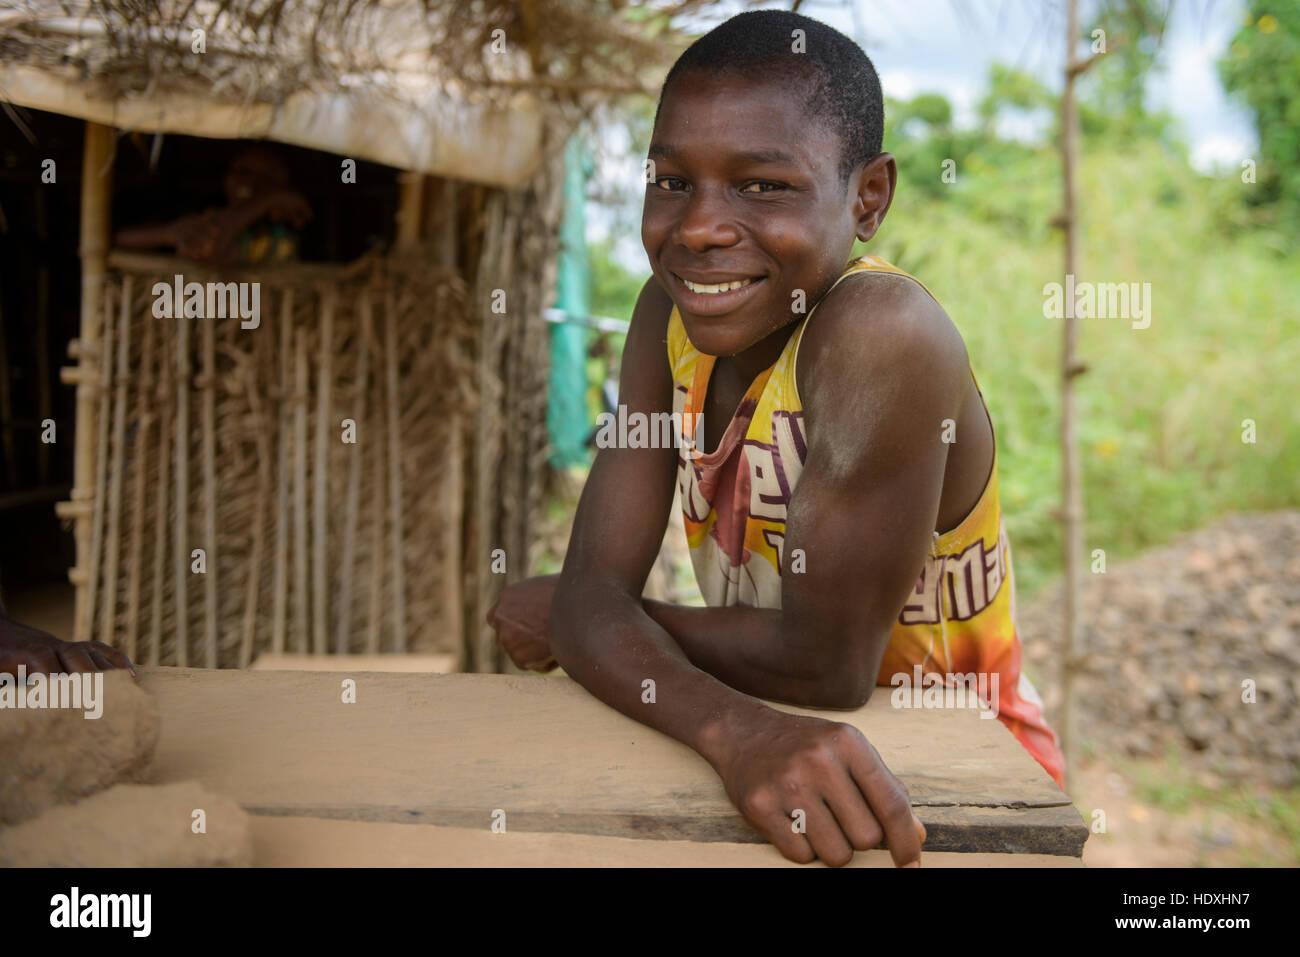 Portraits, Nigeria - Stock Image